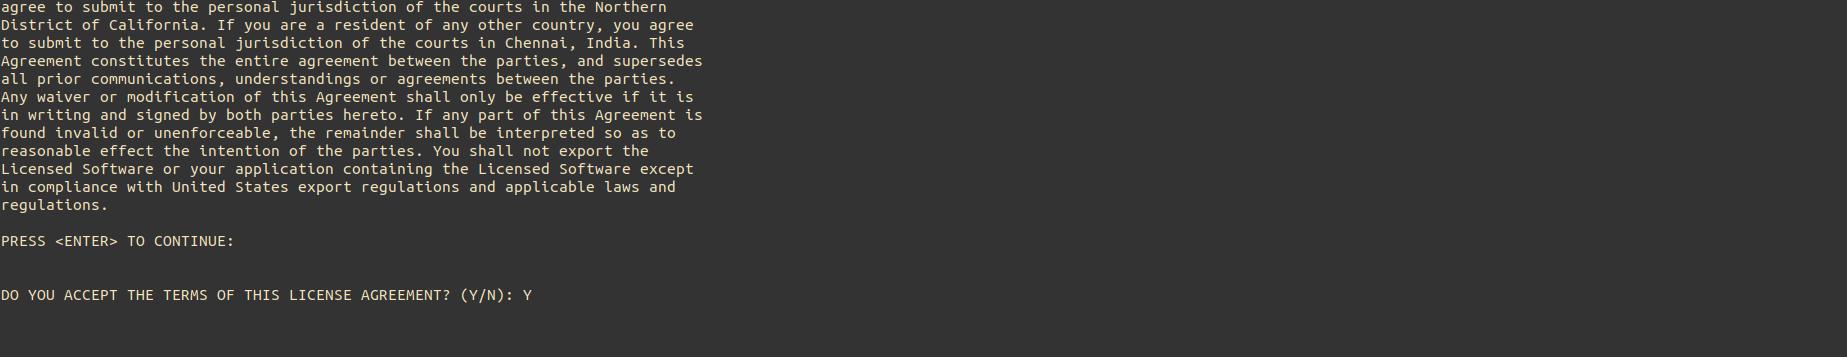 NCM Probe Linux Installation Step2